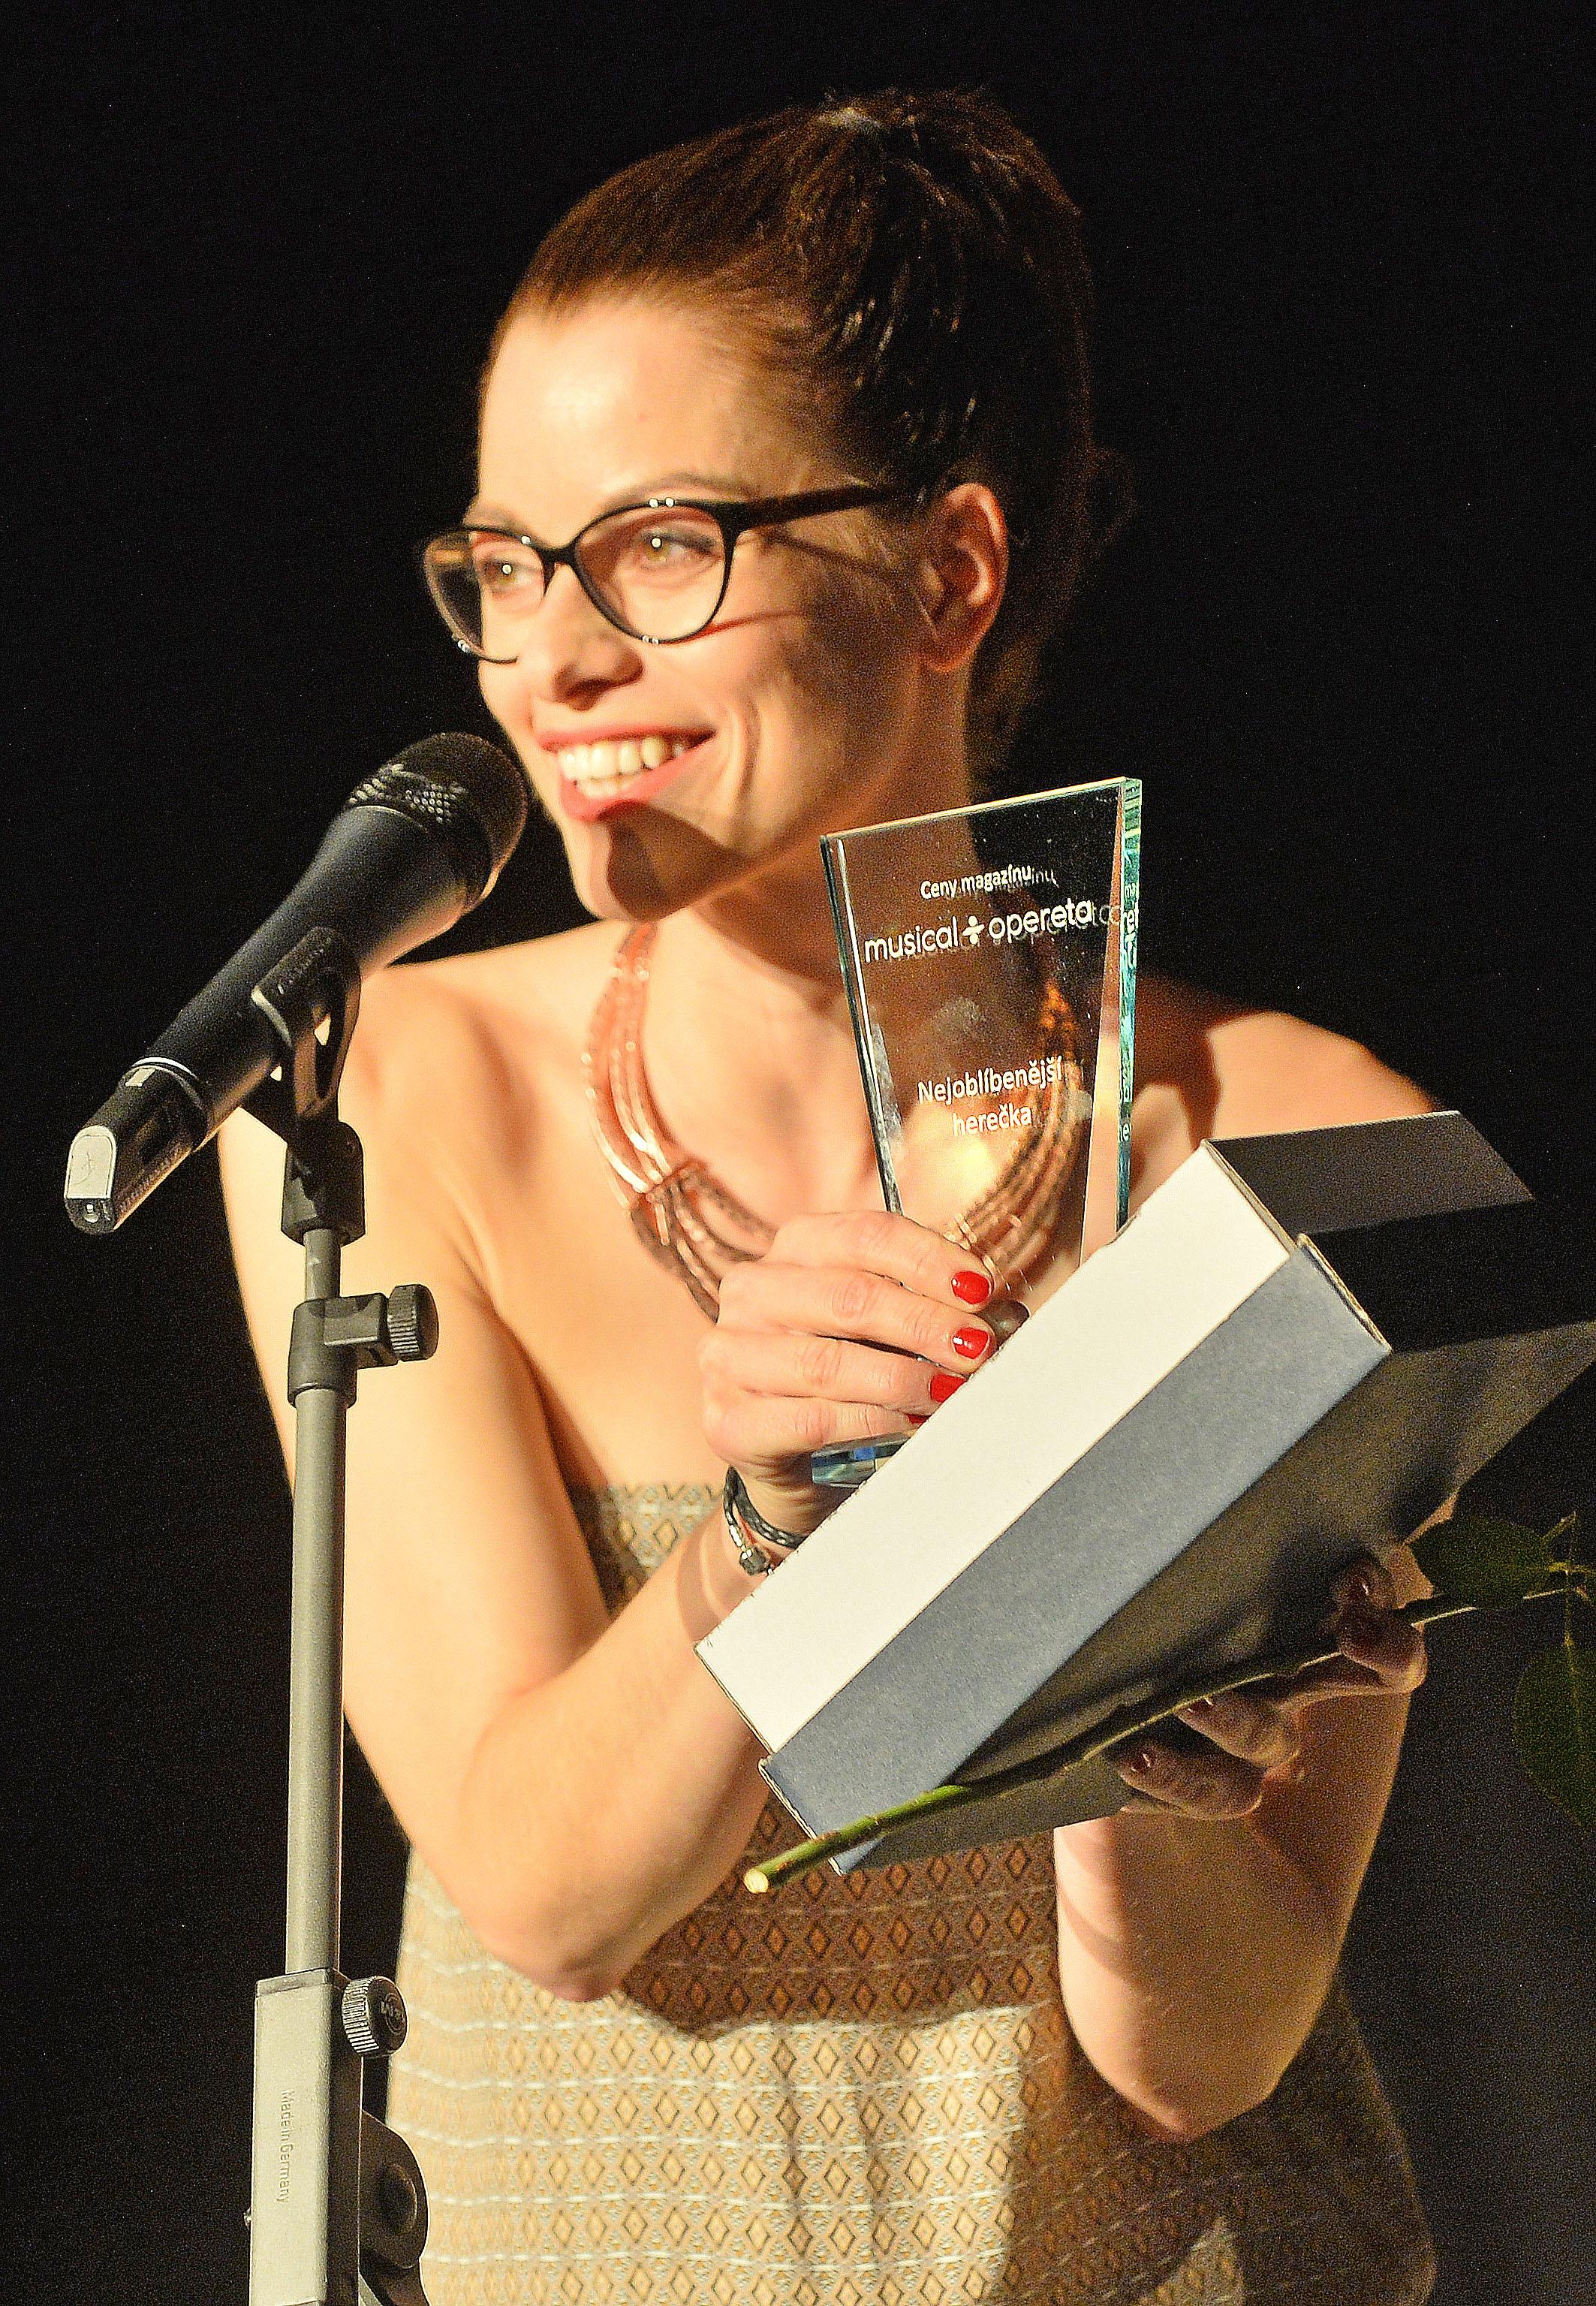 Hana Holišová - Ceny musical-opereta - Editorial 2016